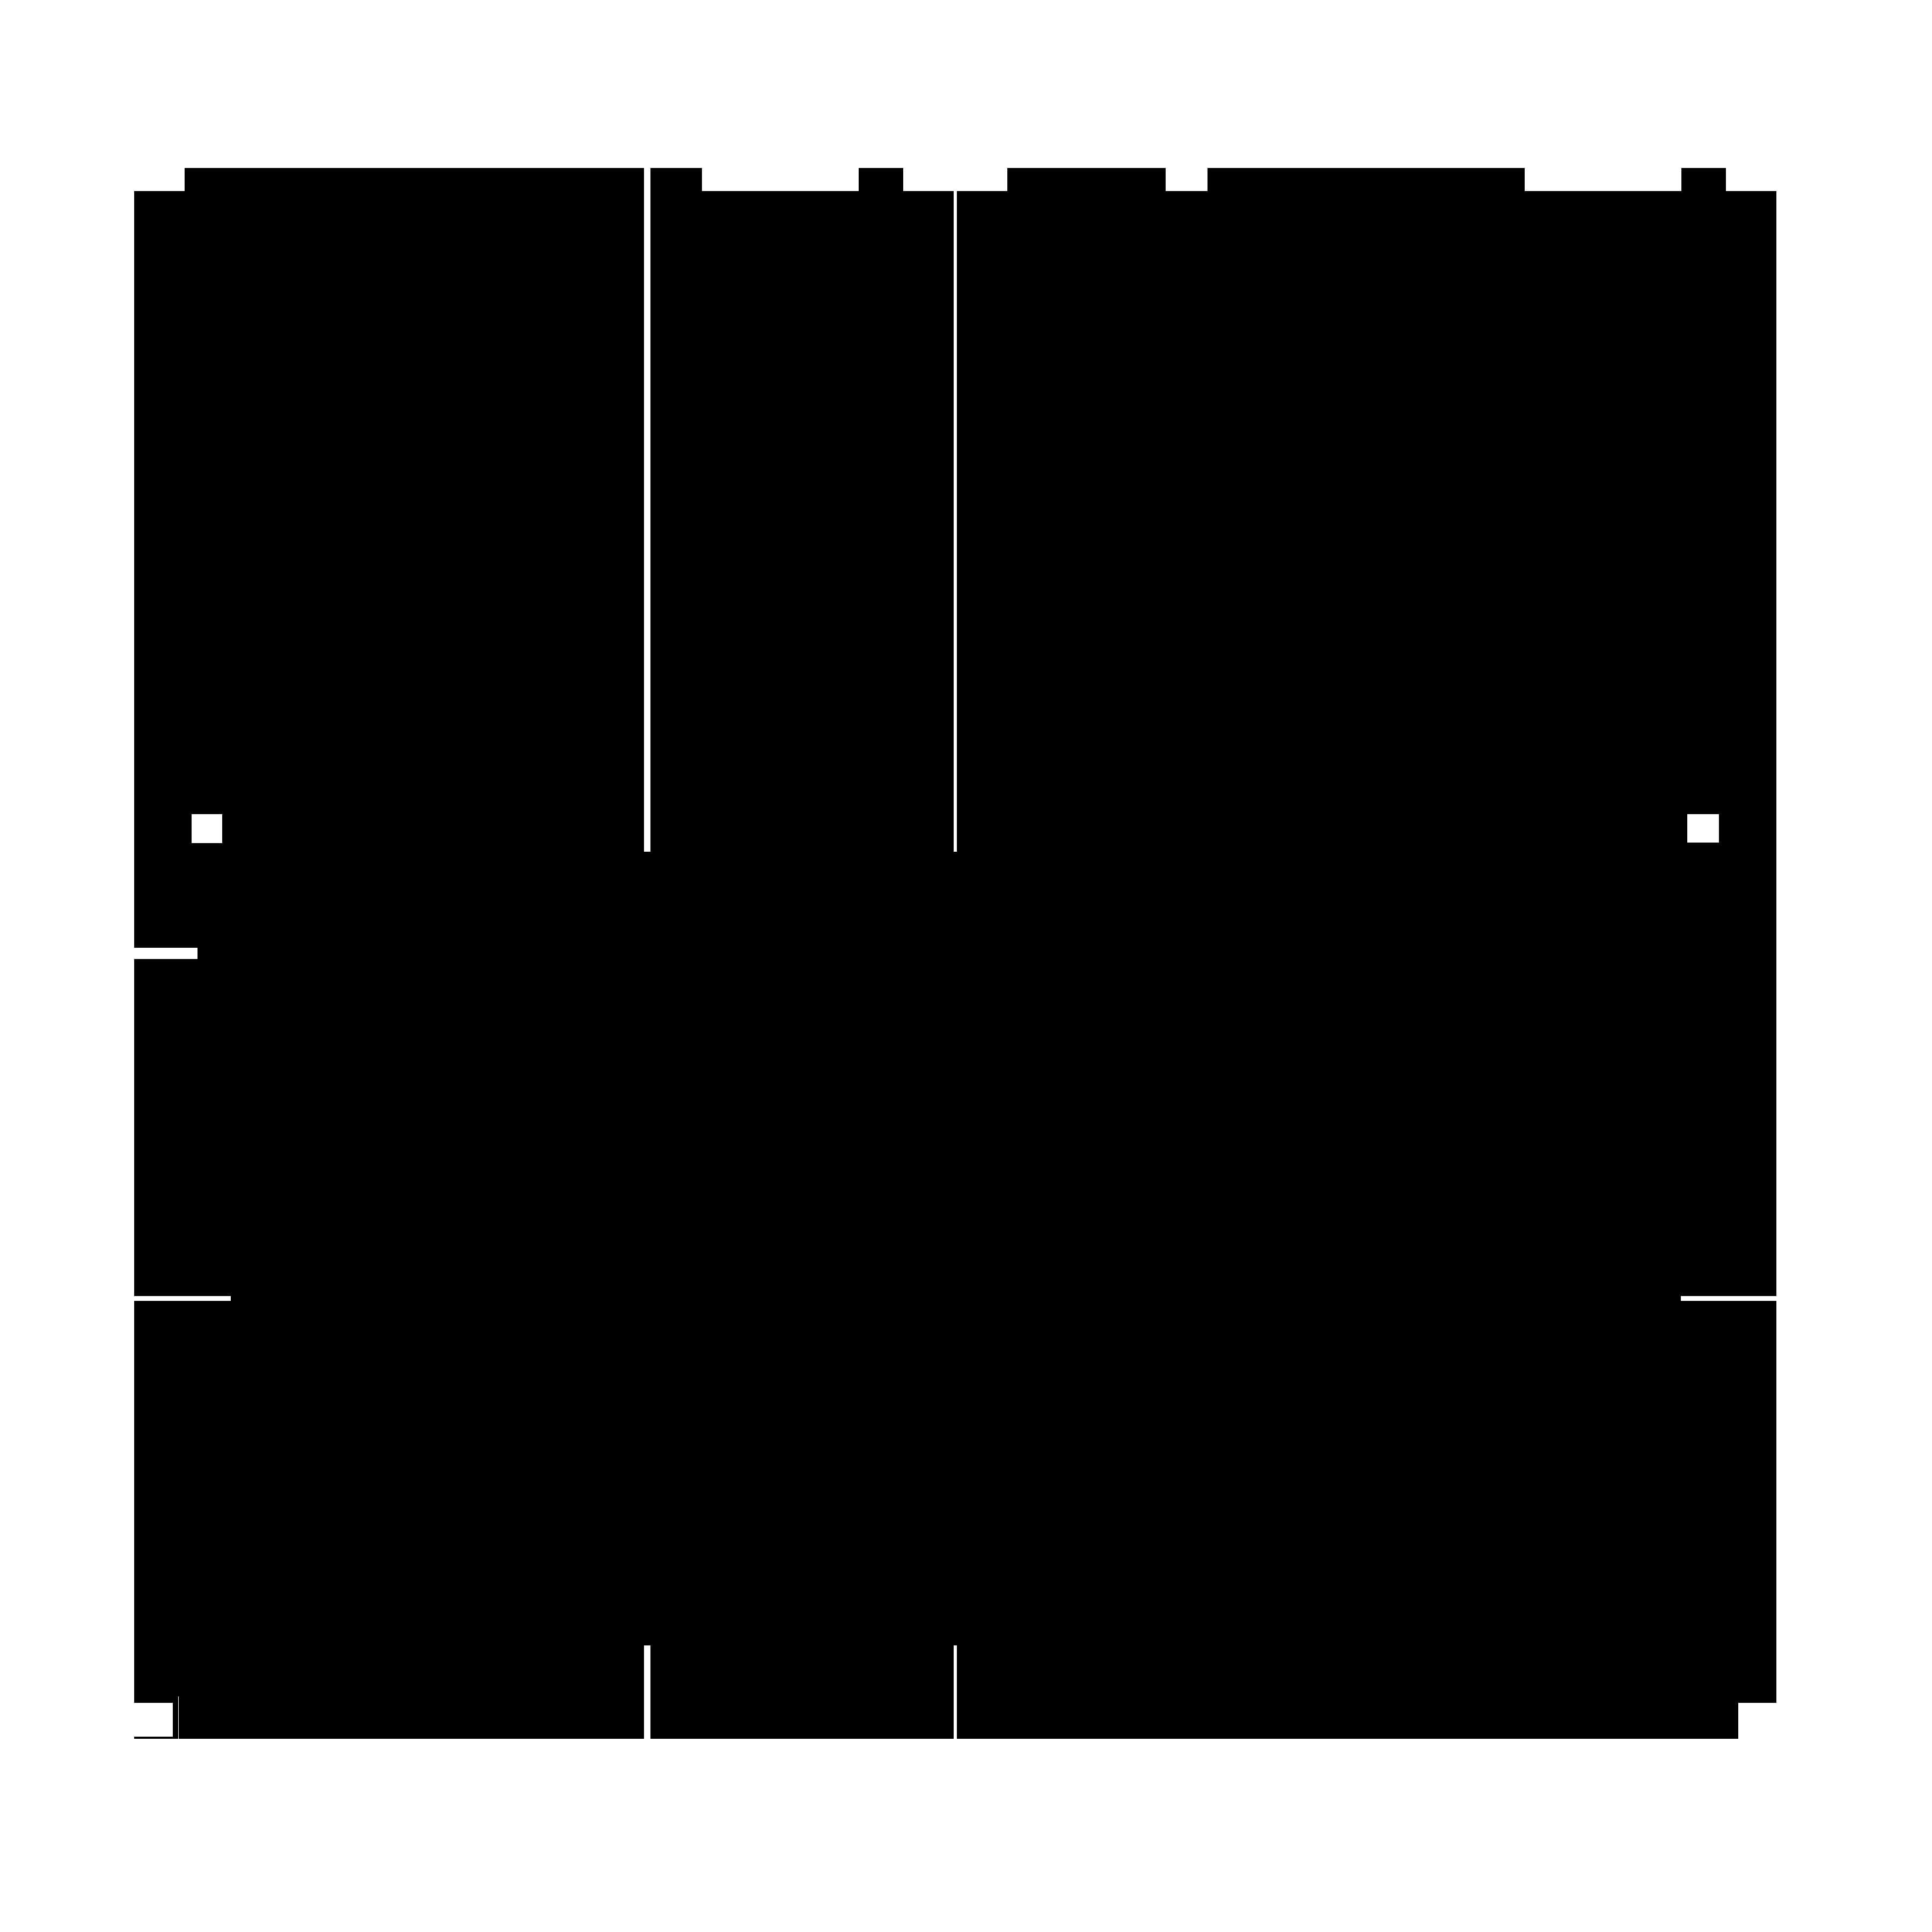 Samsung Clx-9250nd User Manual Dutch (19.86 MB)